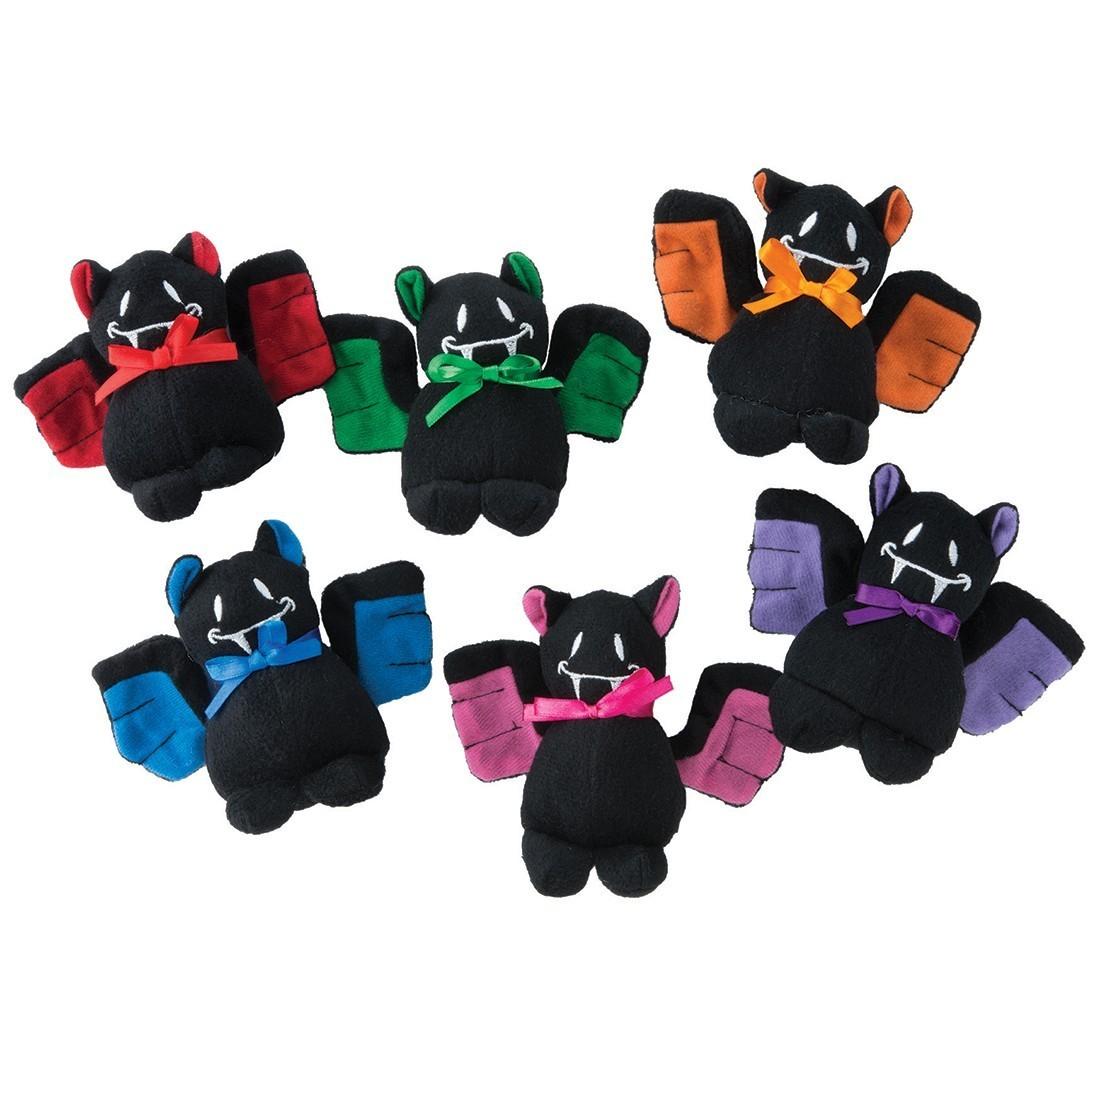 Plush Bean Bag Bats [image]